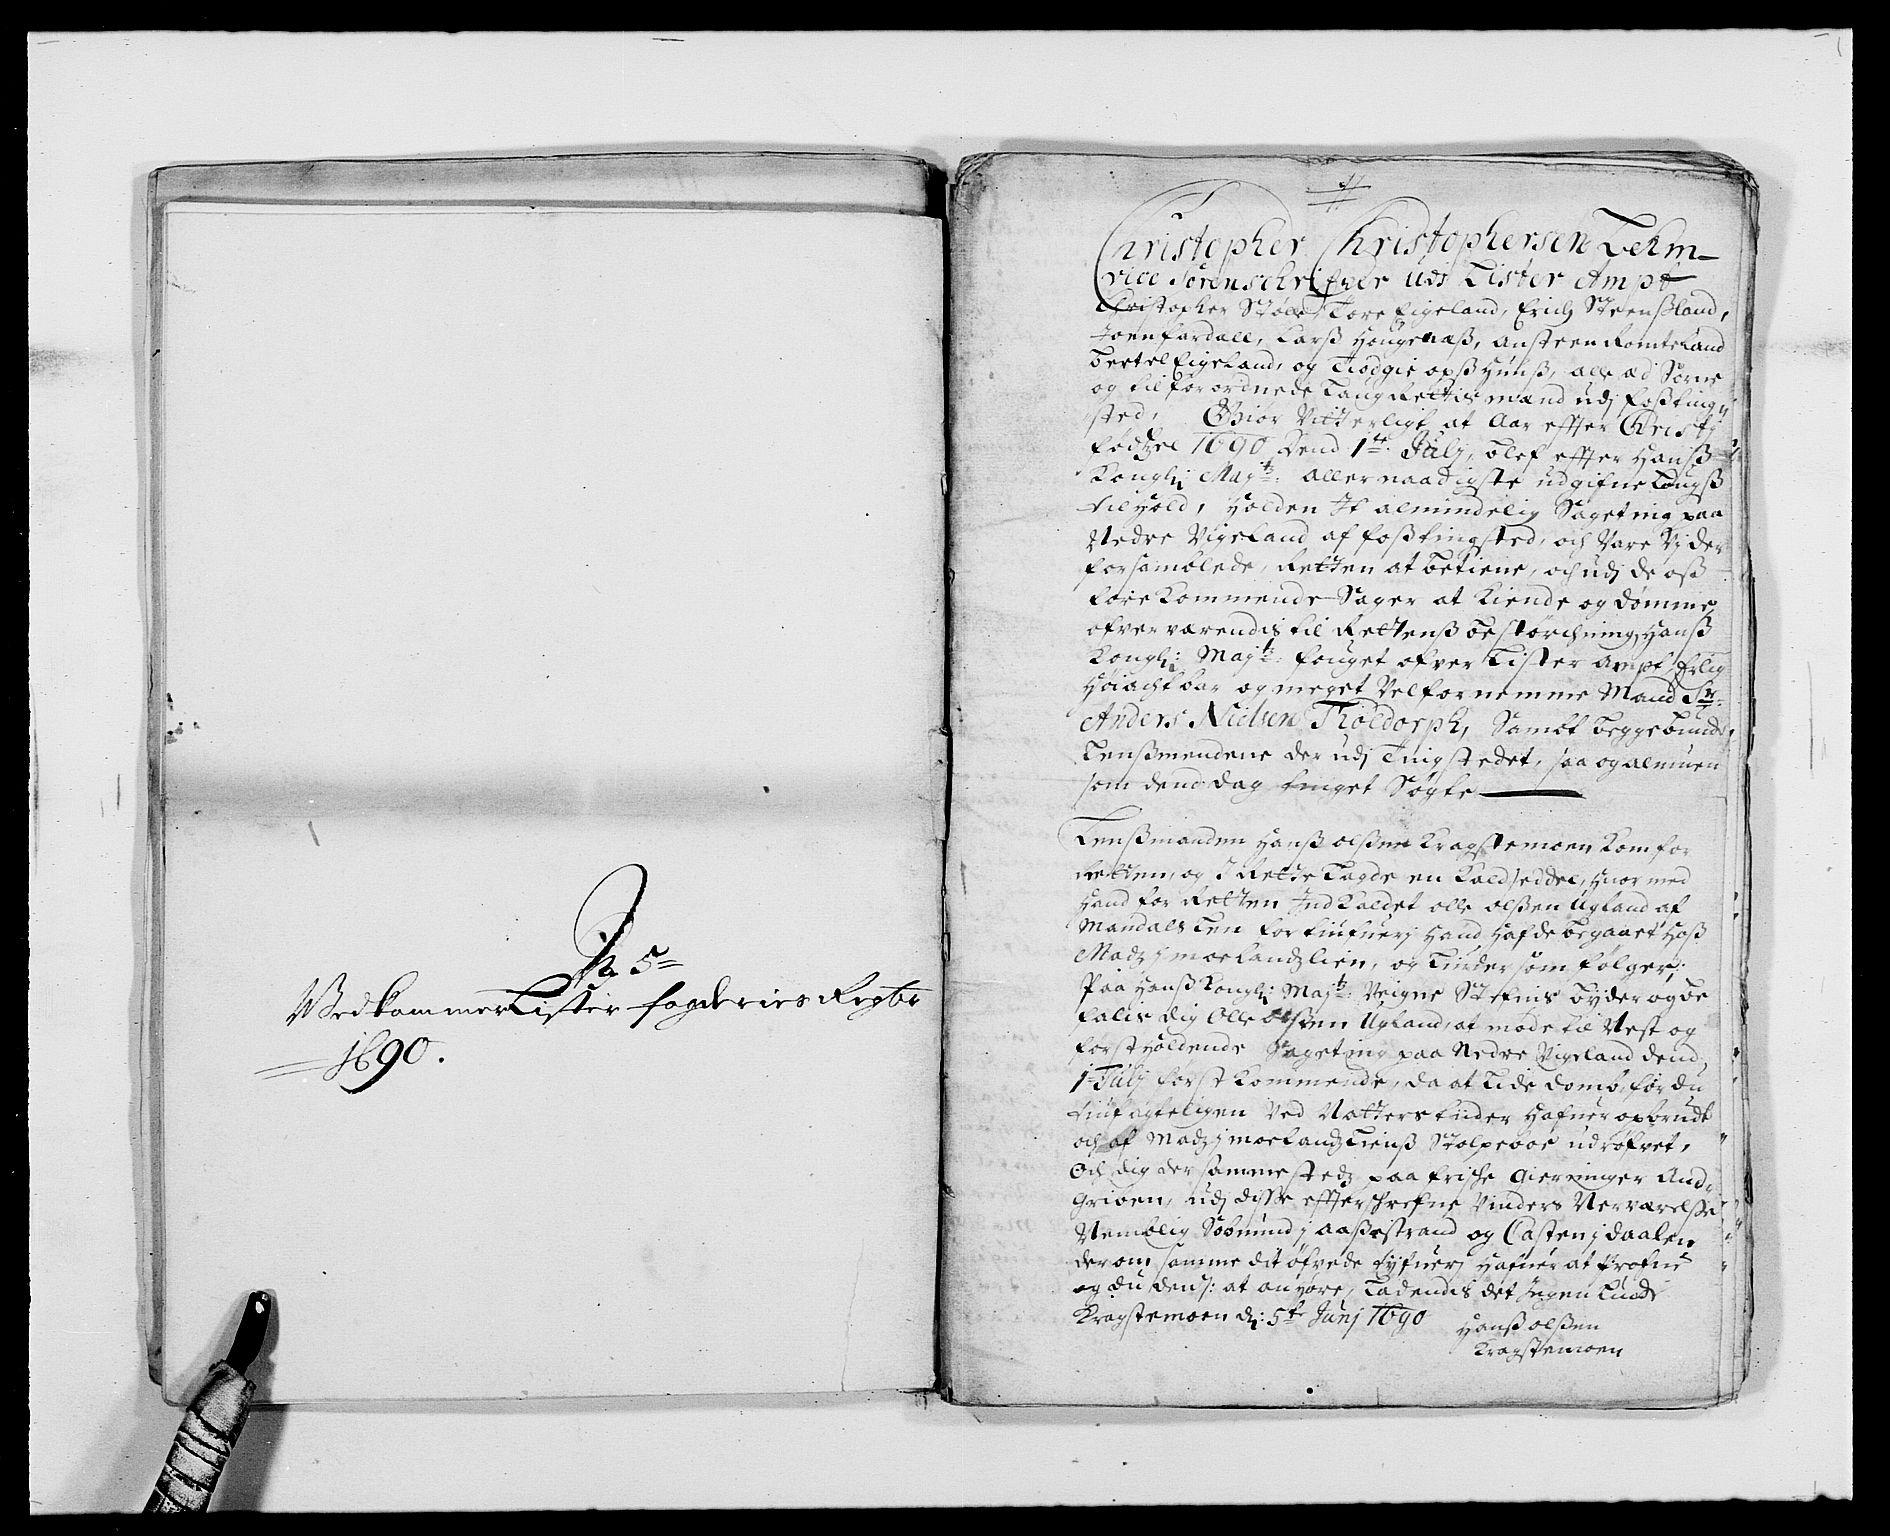 RA, Rentekammeret inntil 1814, Reviderte regnskaper, Fogderegnskap, R41/L2536: Fogderegnskap Lista, 1690-1693, s. 99